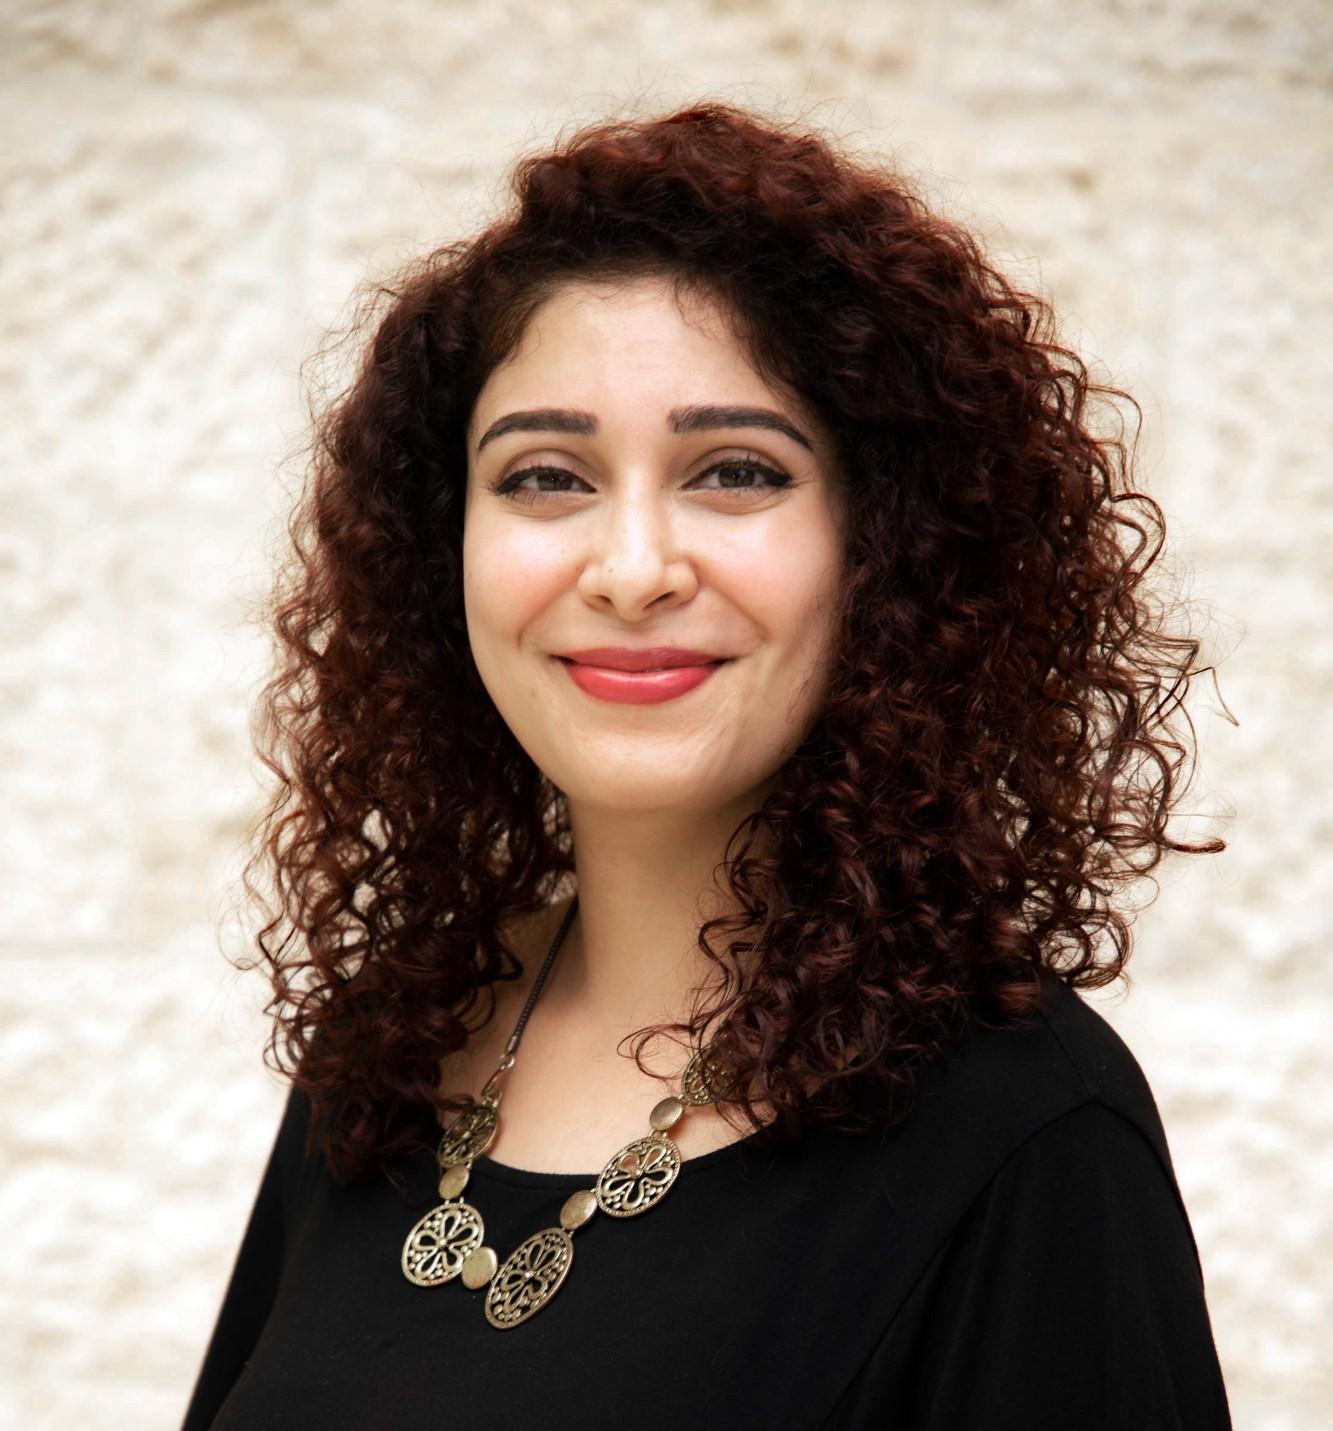 photo of Nour Laswi